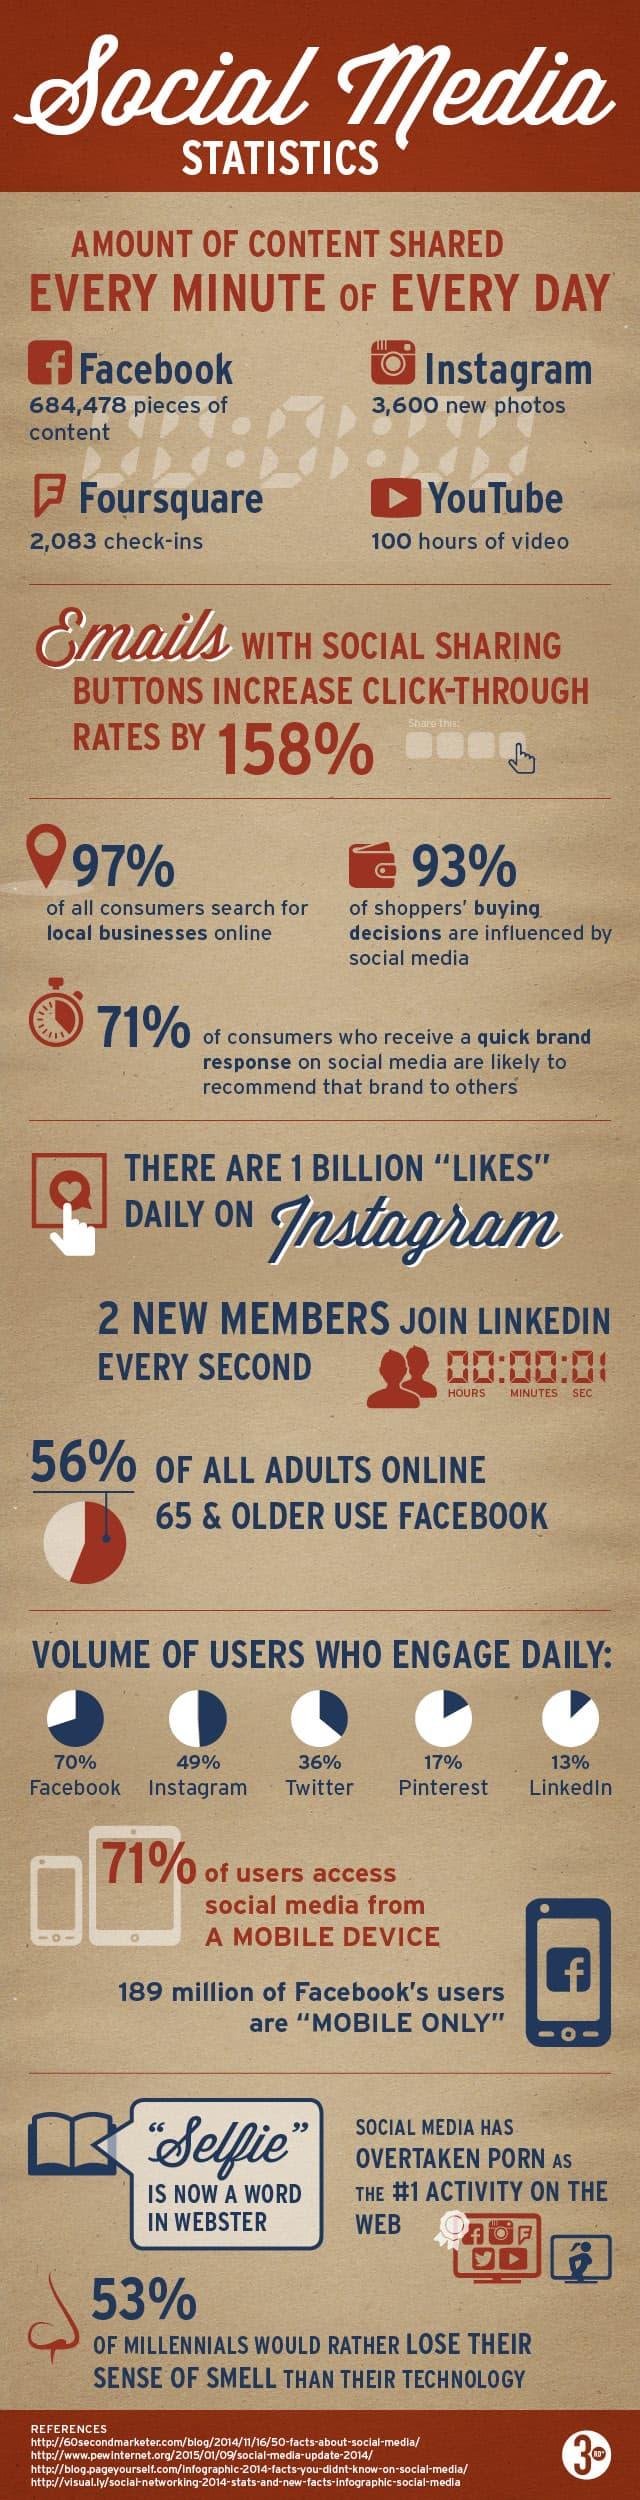 Social-Media-Infographic-01